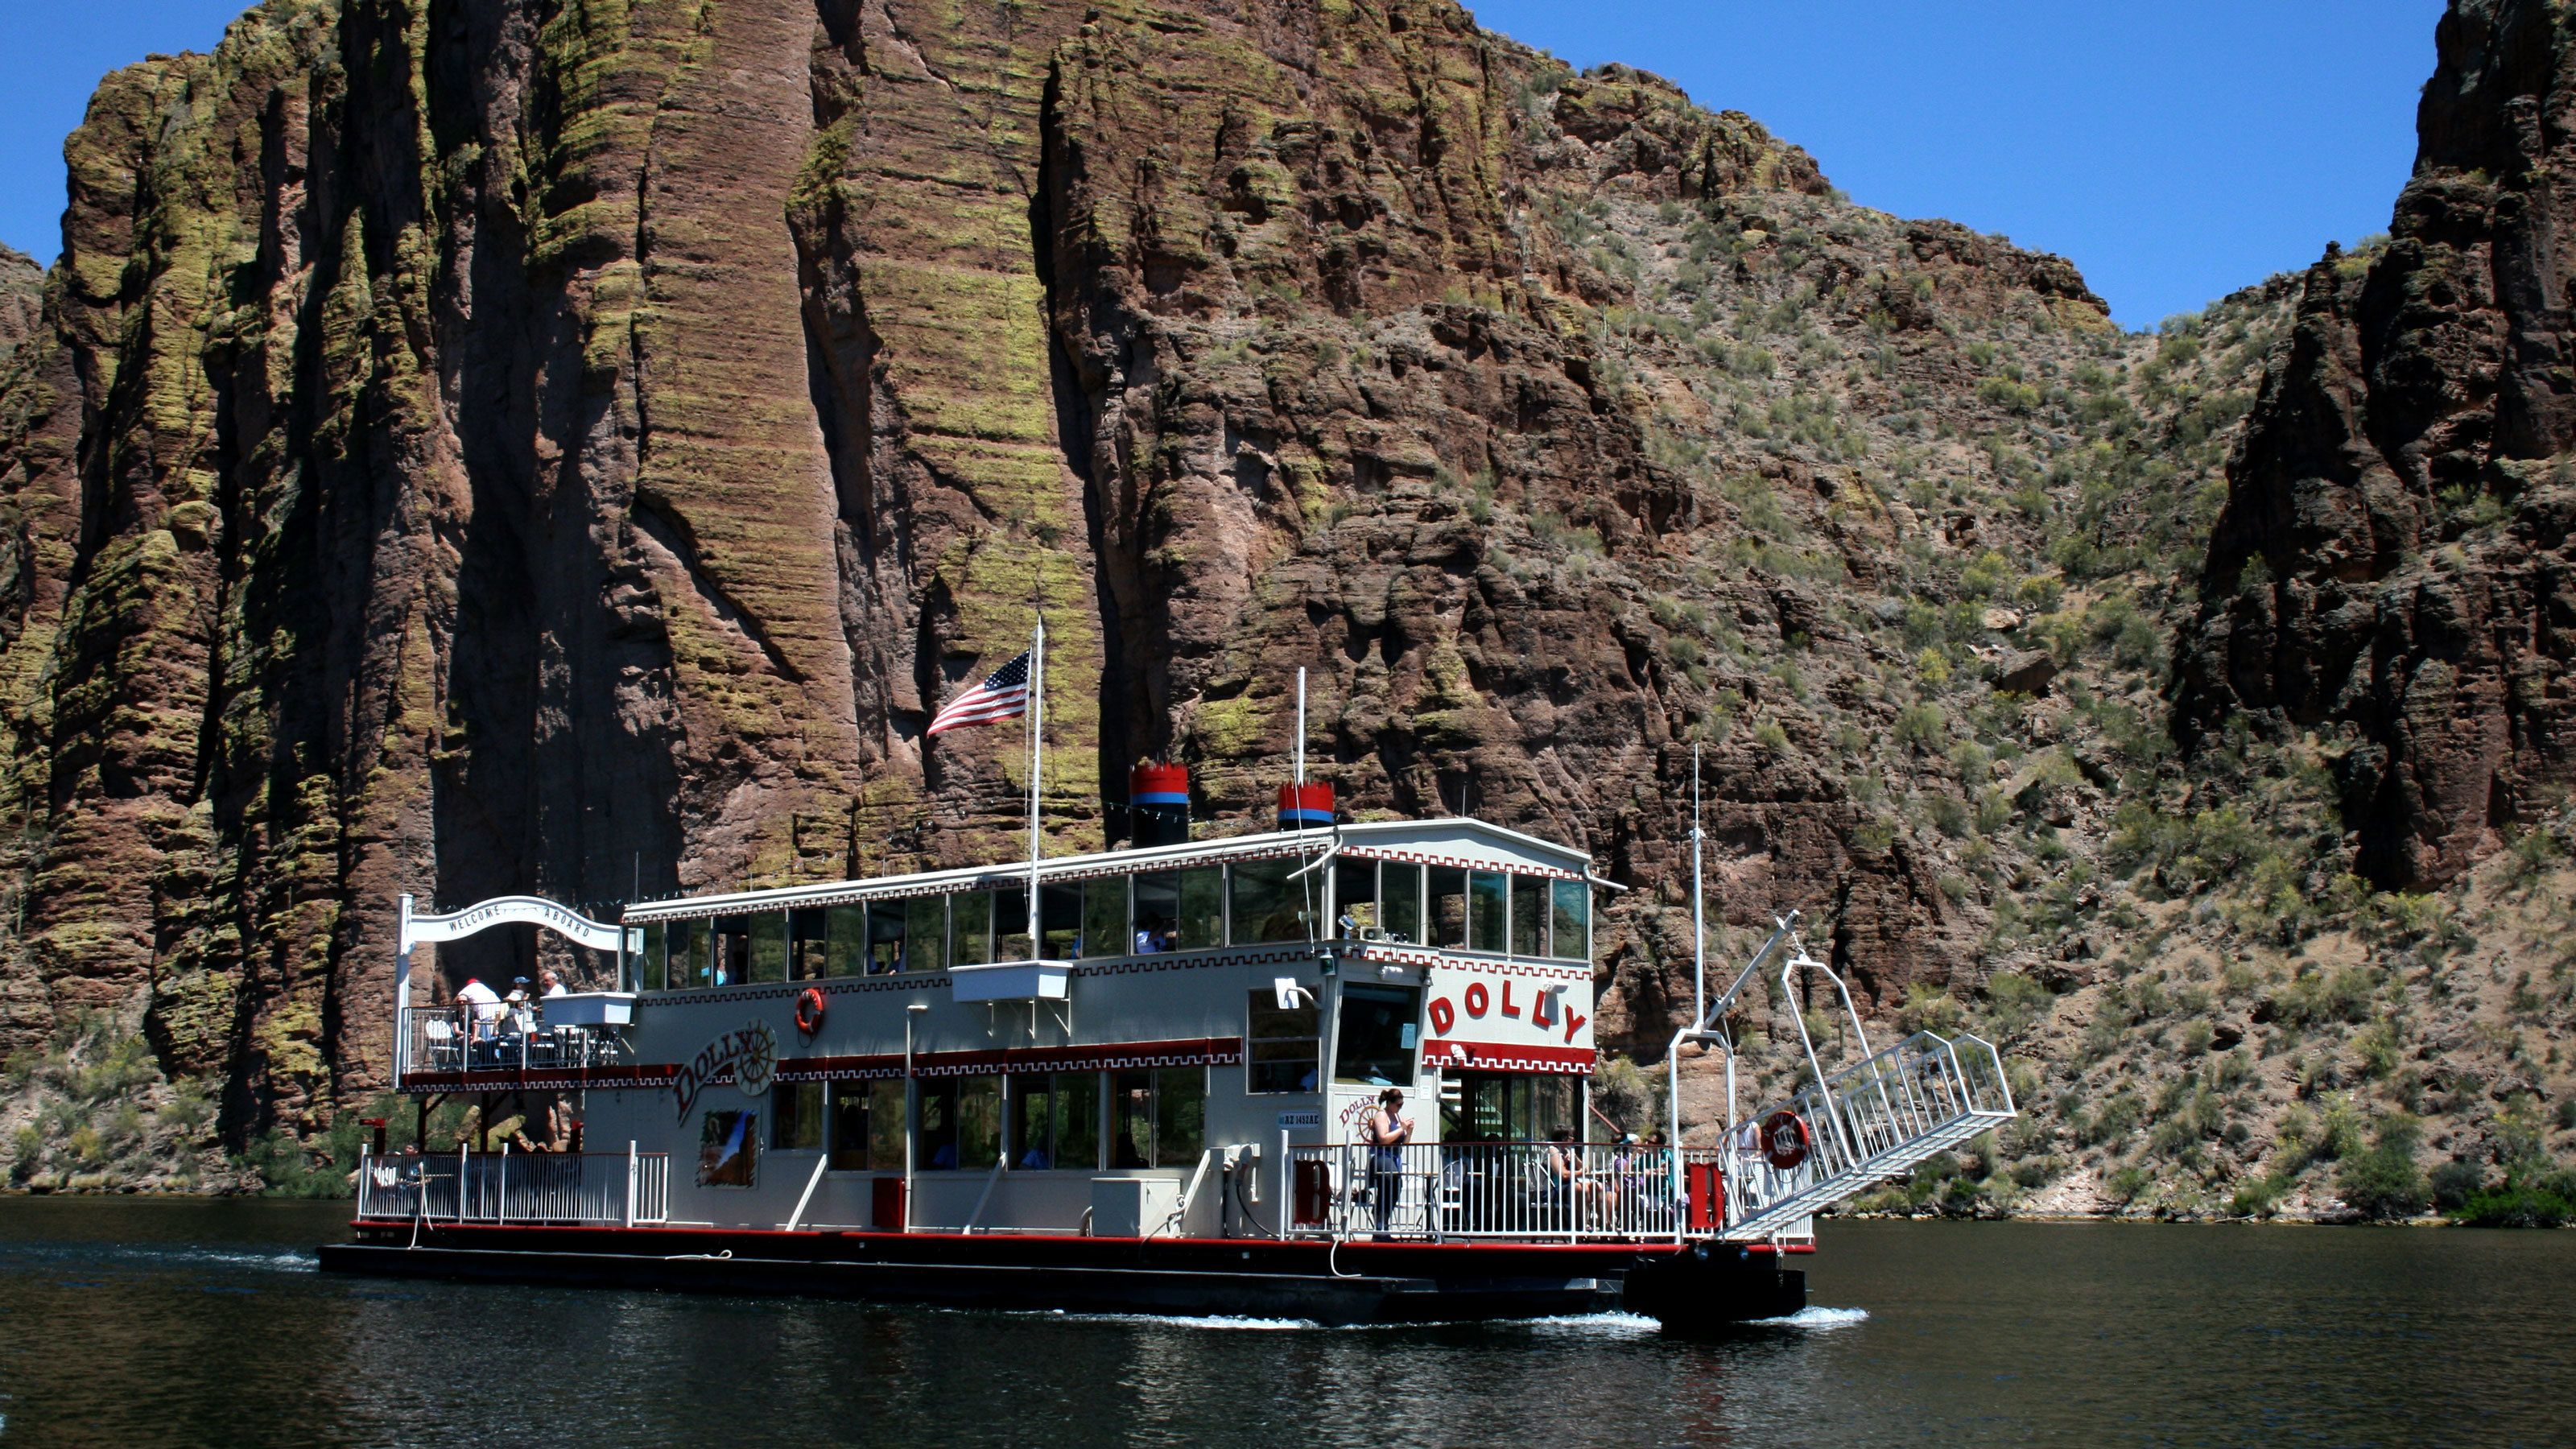 Old-fashioned steamboat on Canyon Lake in Arizona